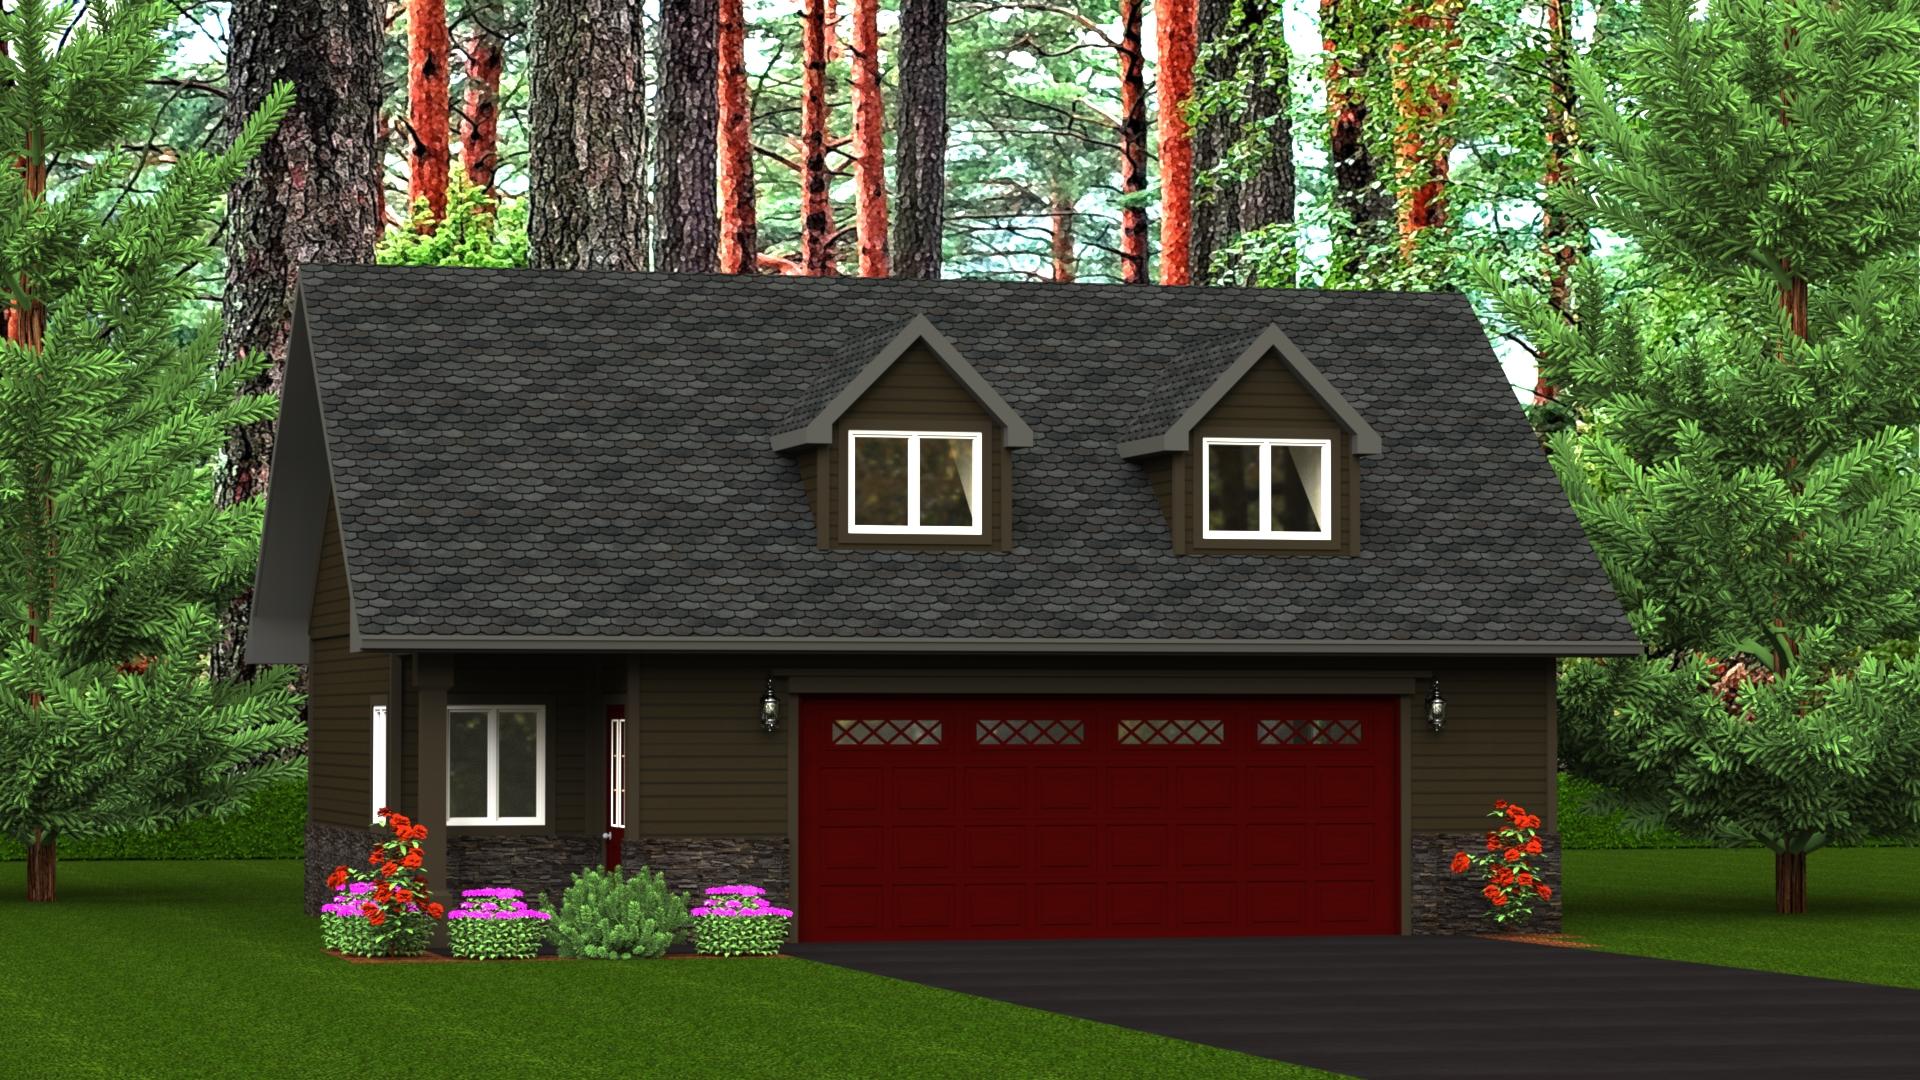 786 sq.ft. timber mart 2 car garage exterior render